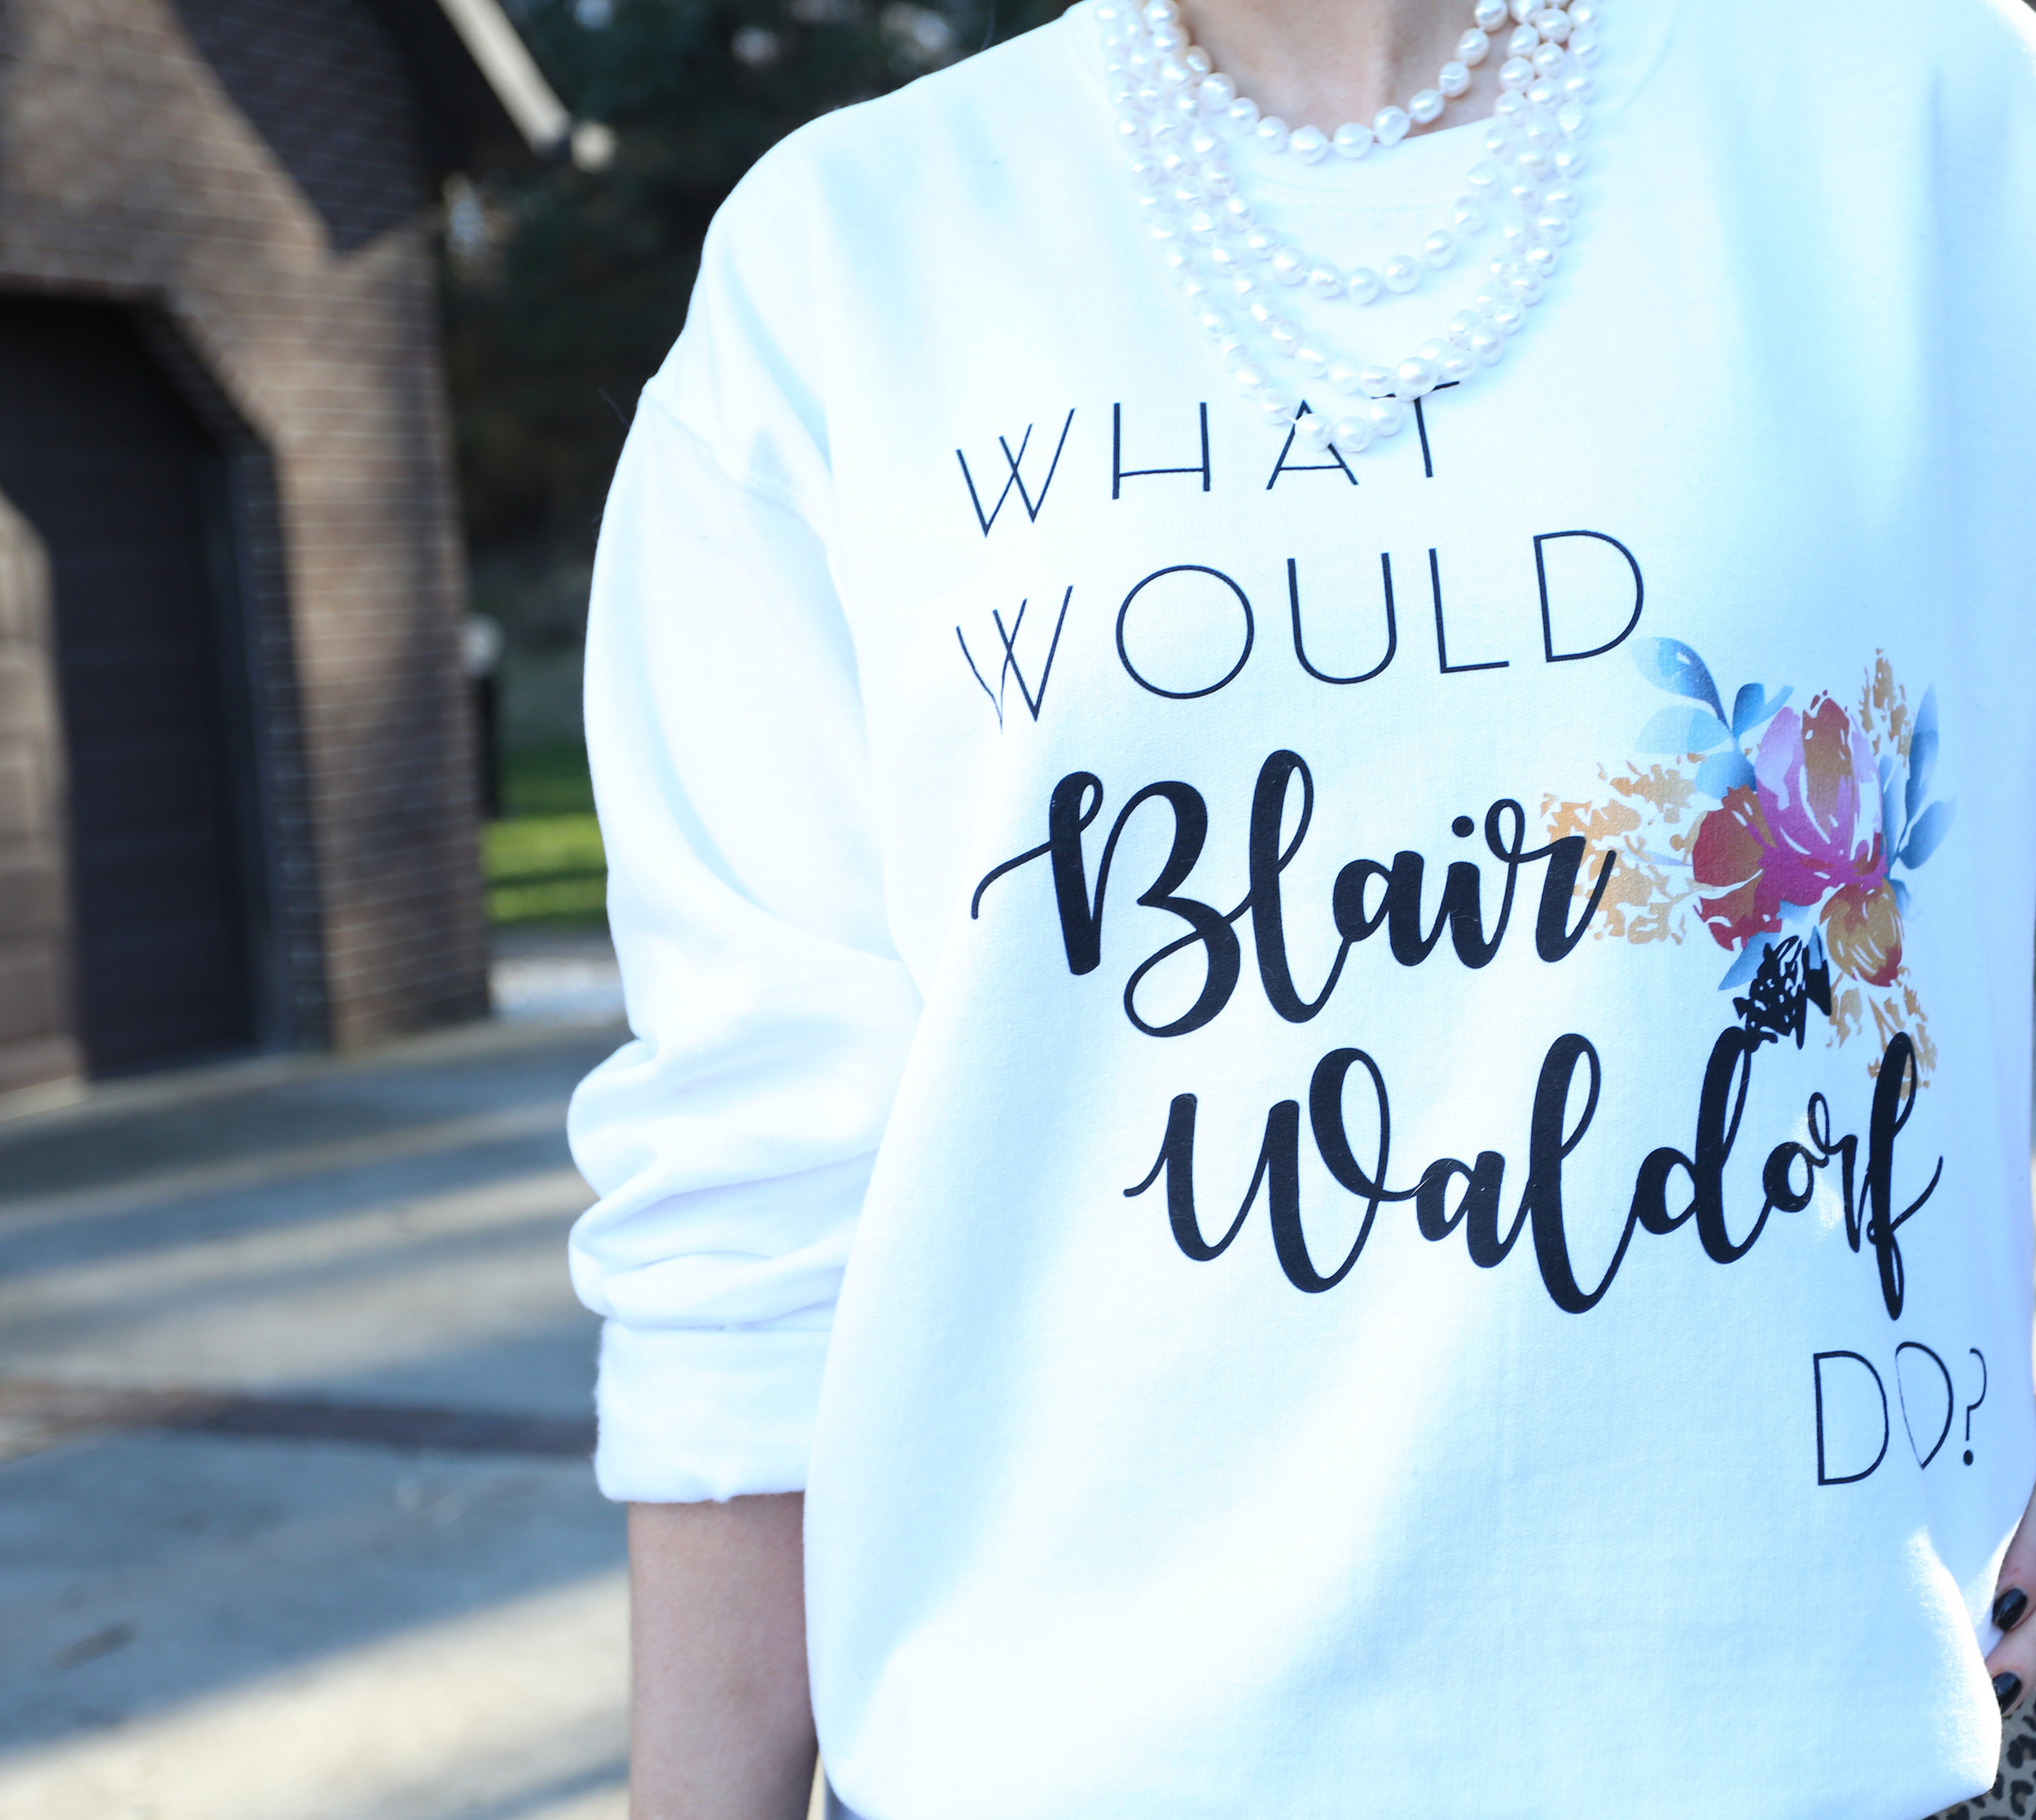 I found this shirt on treatlook.apparel via Instagram